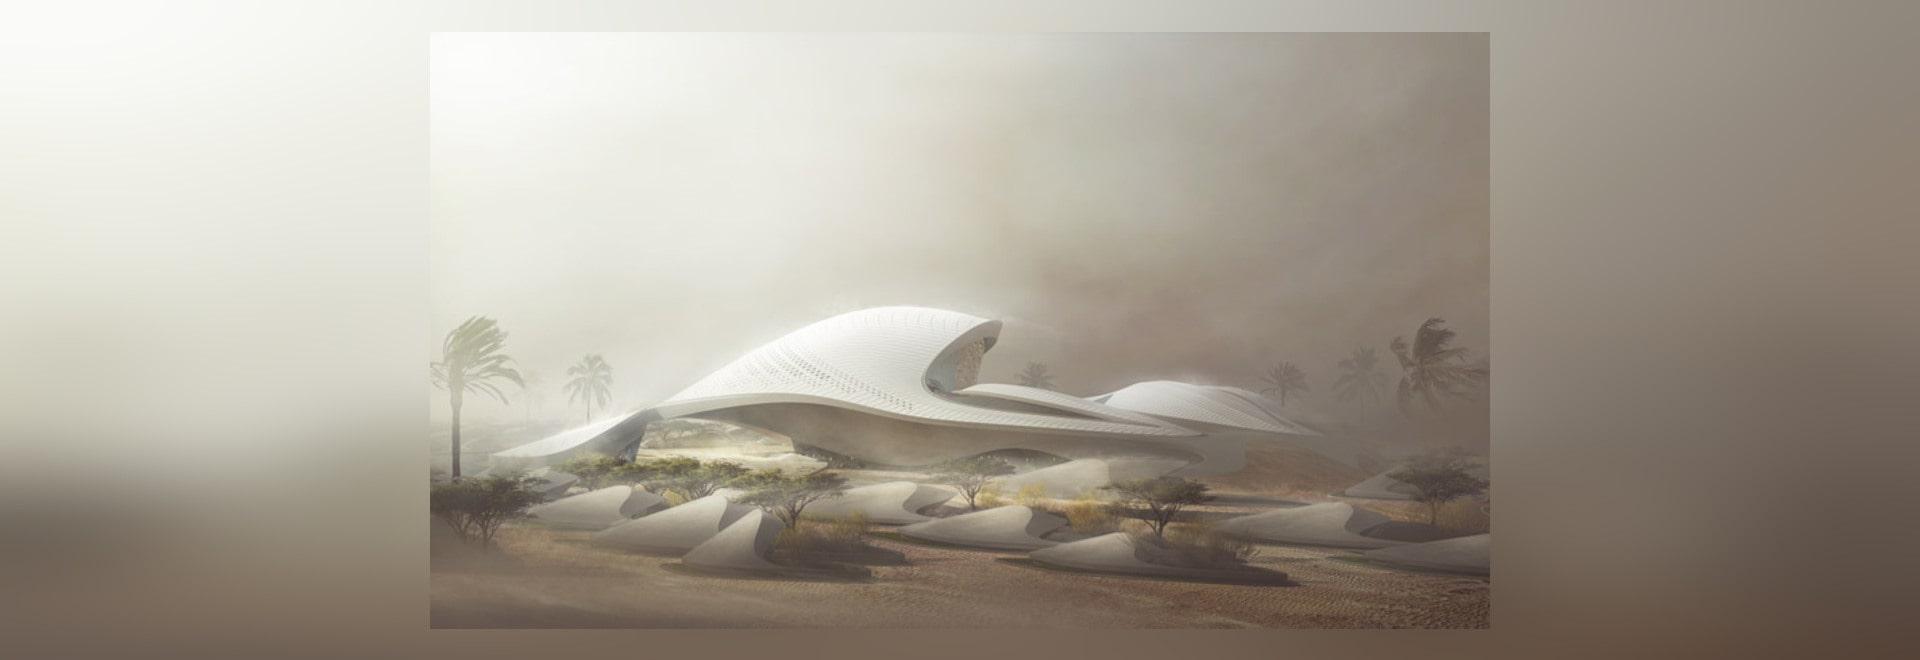 Zaha Hadid designs dune-inspired headquarters for environmental firm